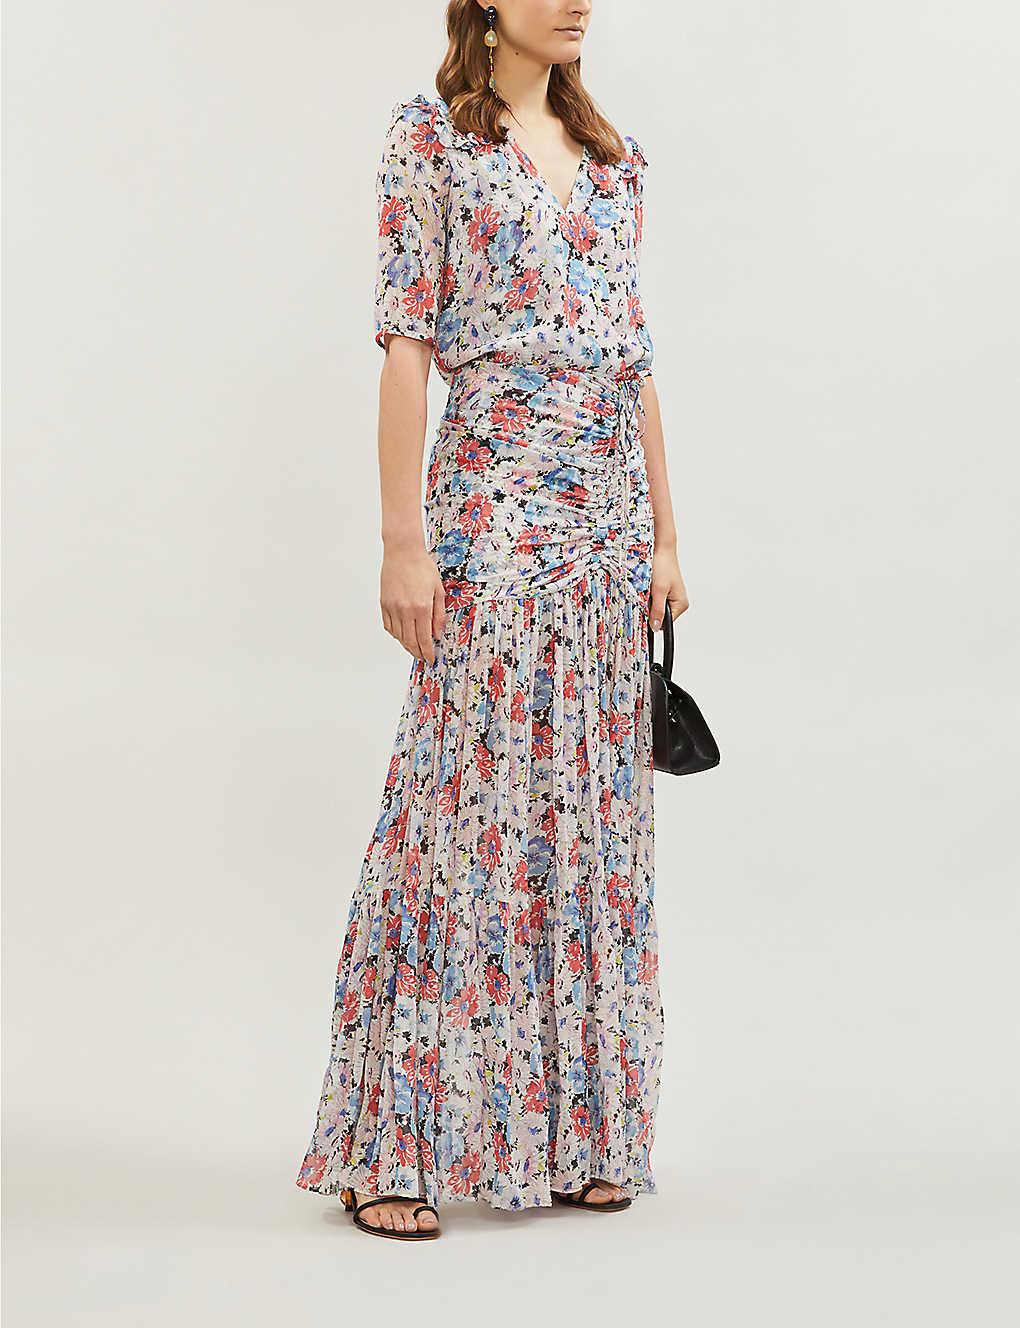 VERONICA BEARD Mick Floral-print Crepe Maxi Dress